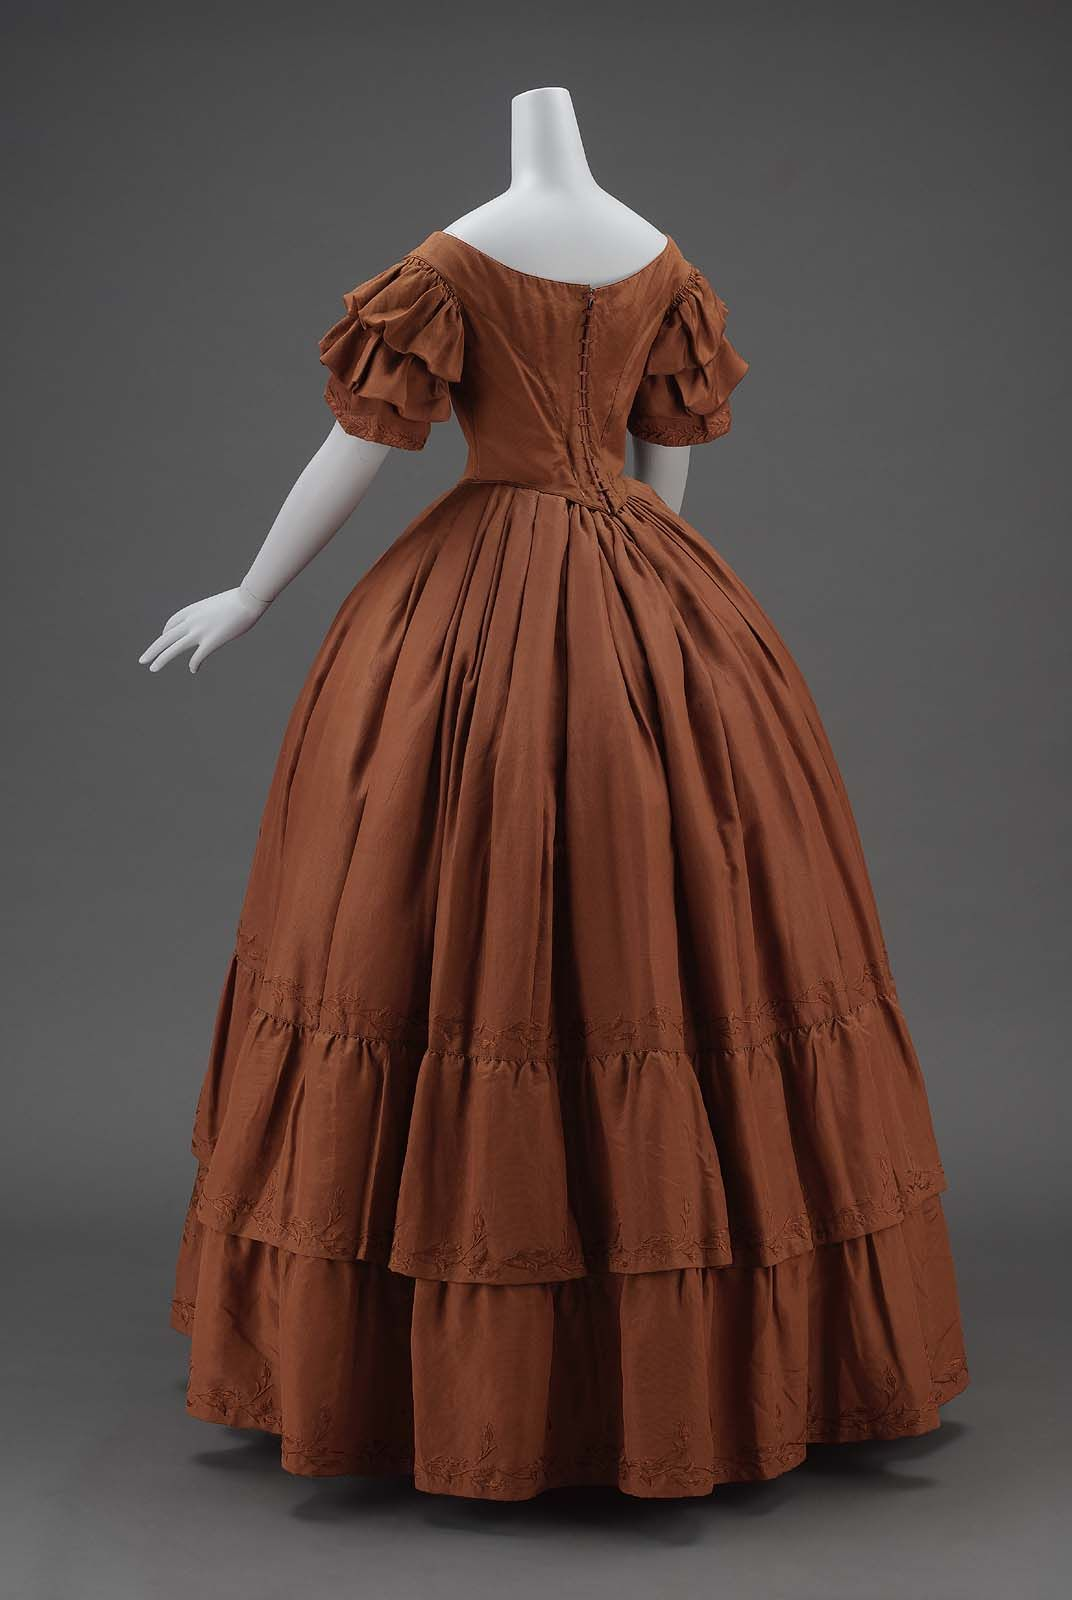 Pin On 19th Century 1840s Women S Fashion [ 1600 x 1072 Pixel ]